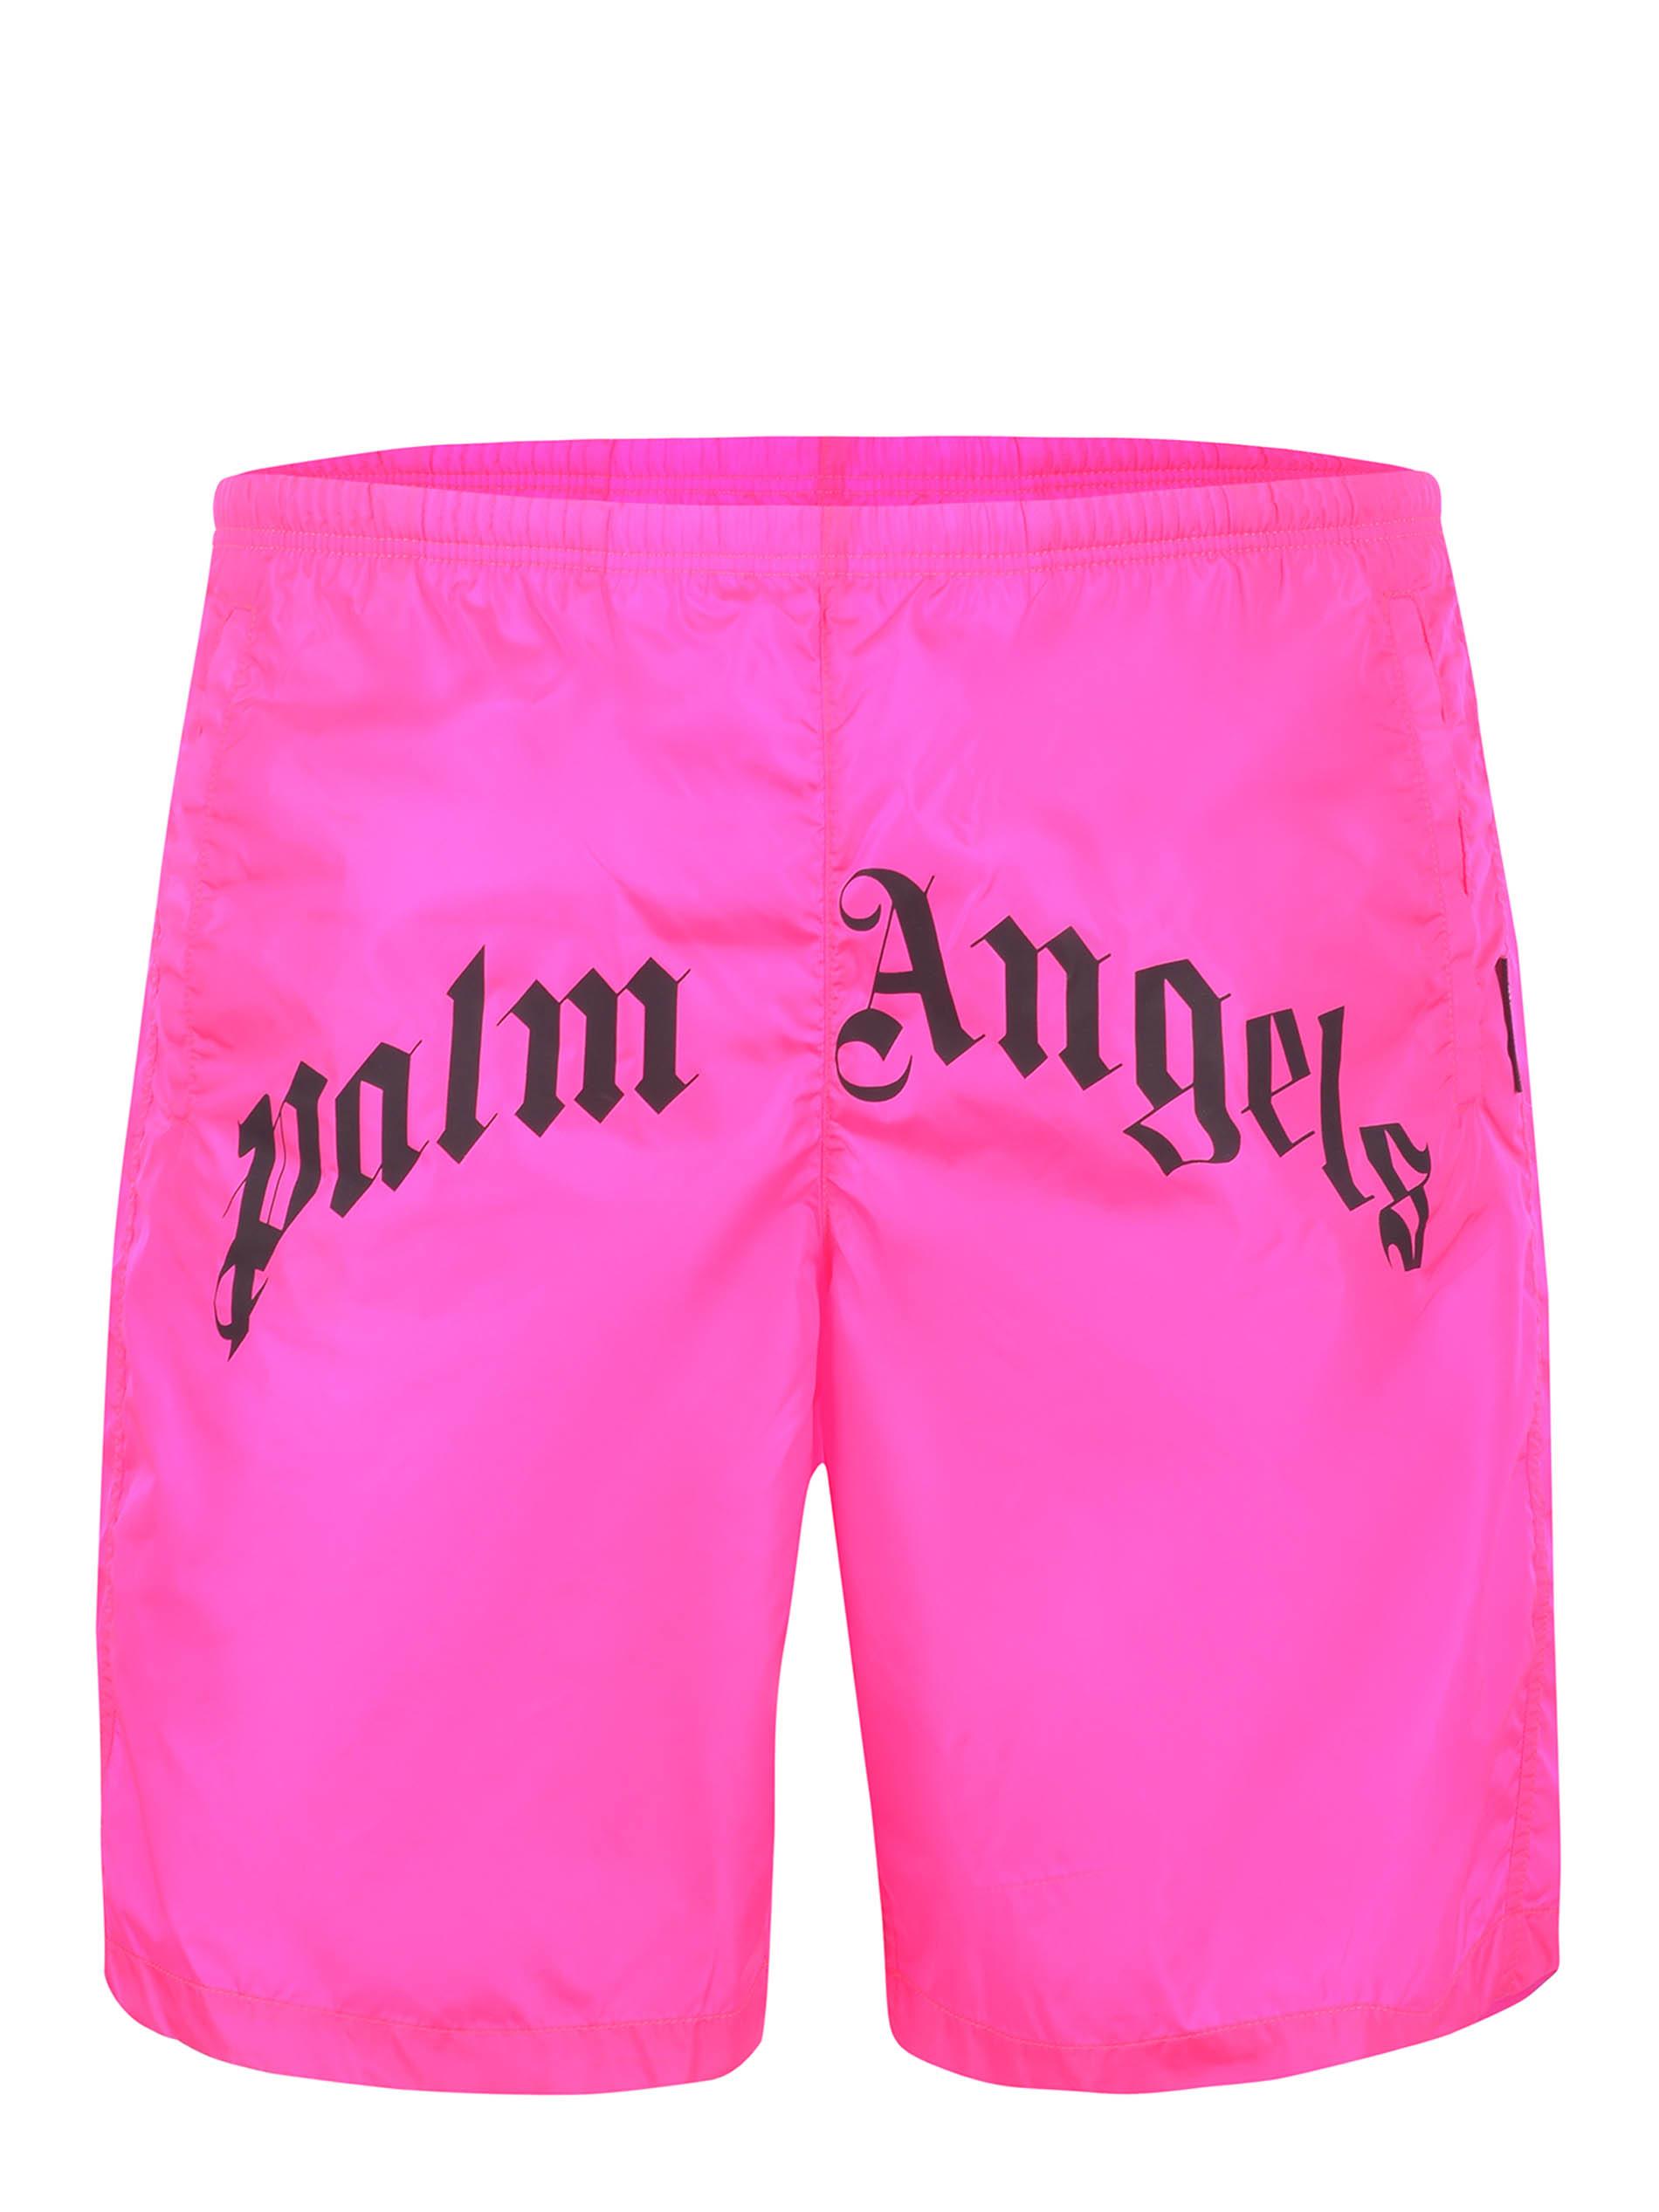 Costume Palm Angels Bright curved logo swim in nylon PALM ANGELS | 30 | PMFA005S21FAB0043210